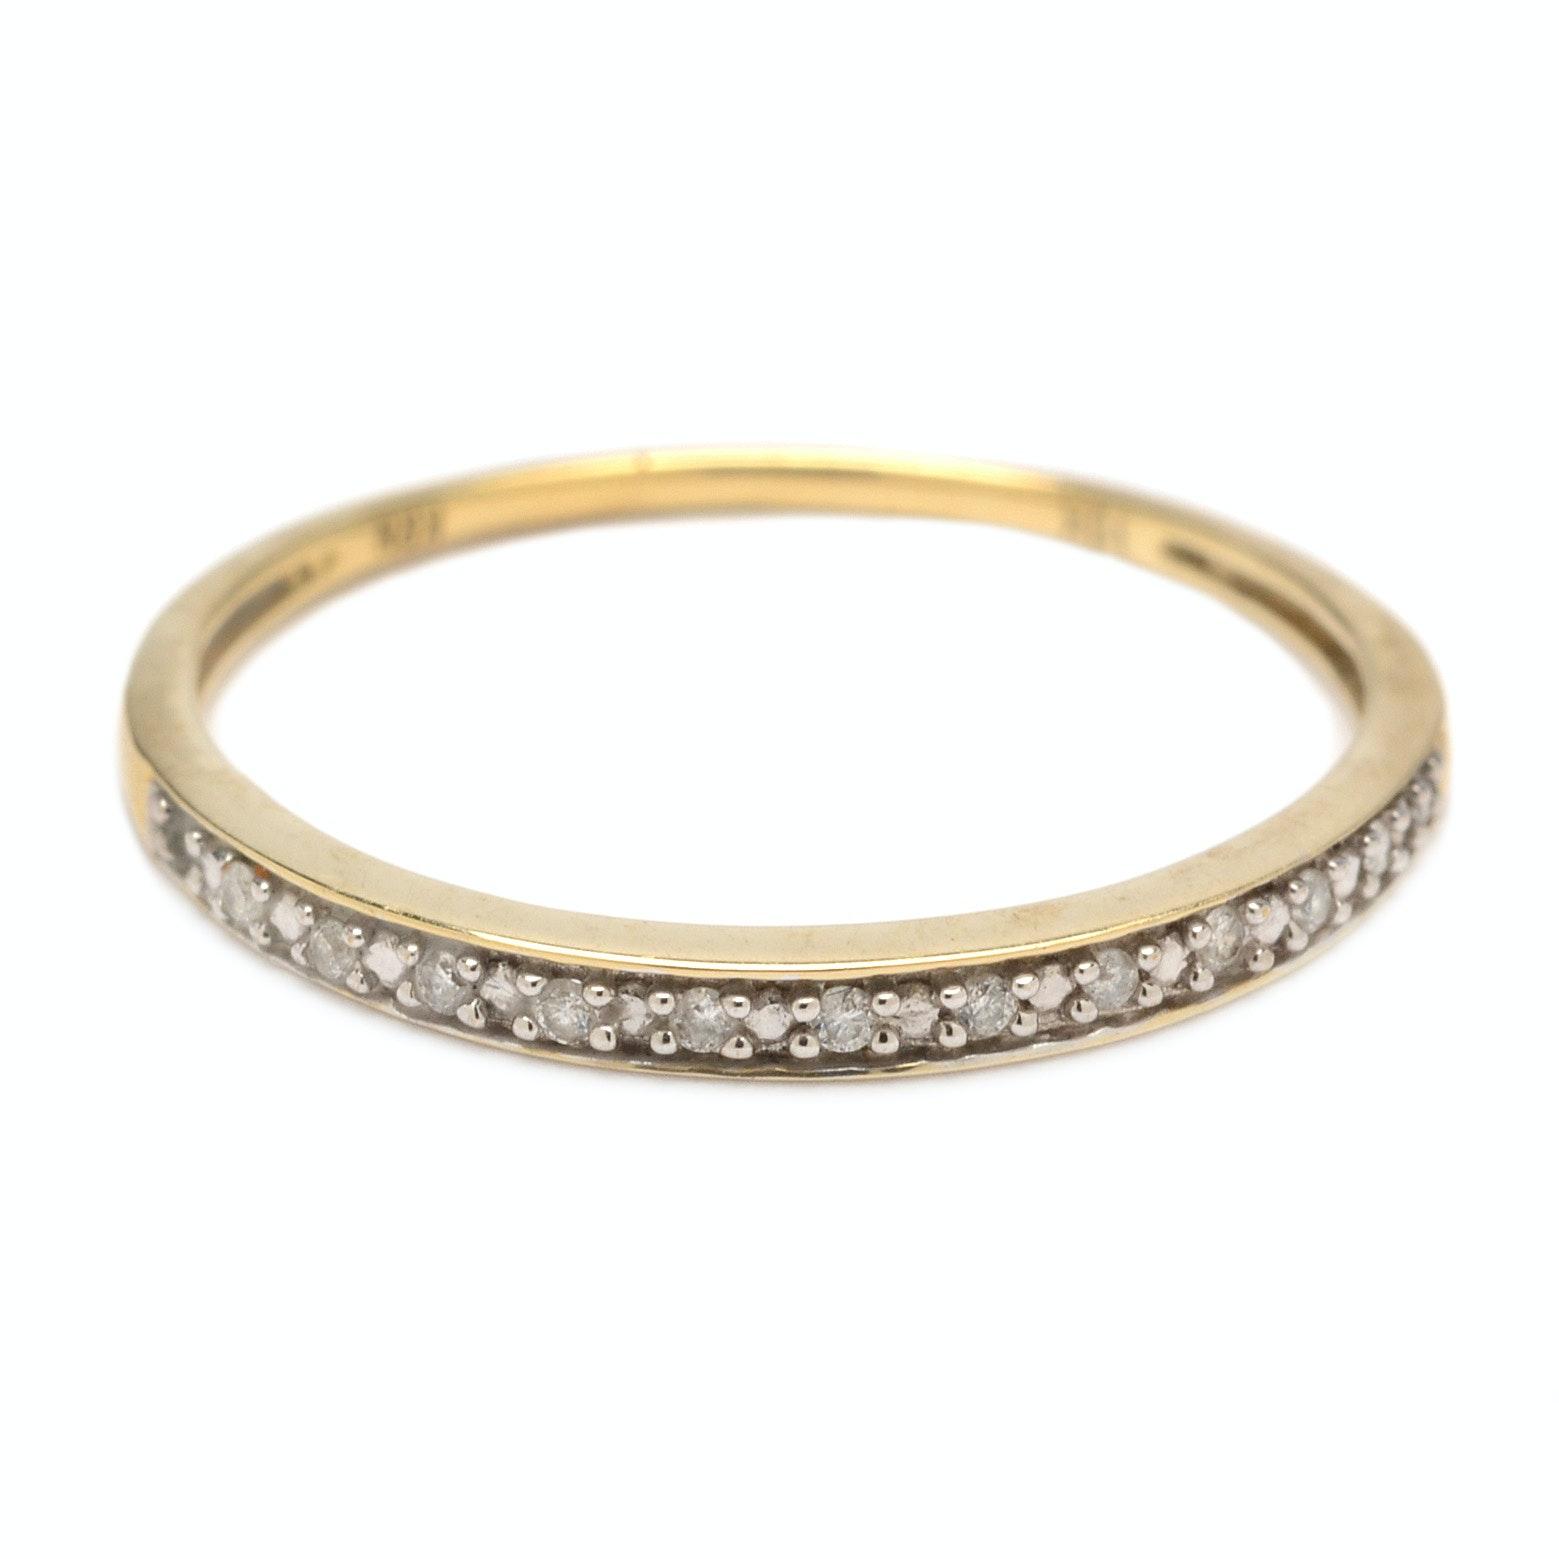 10K Yellow Gold Diamond Ring Band